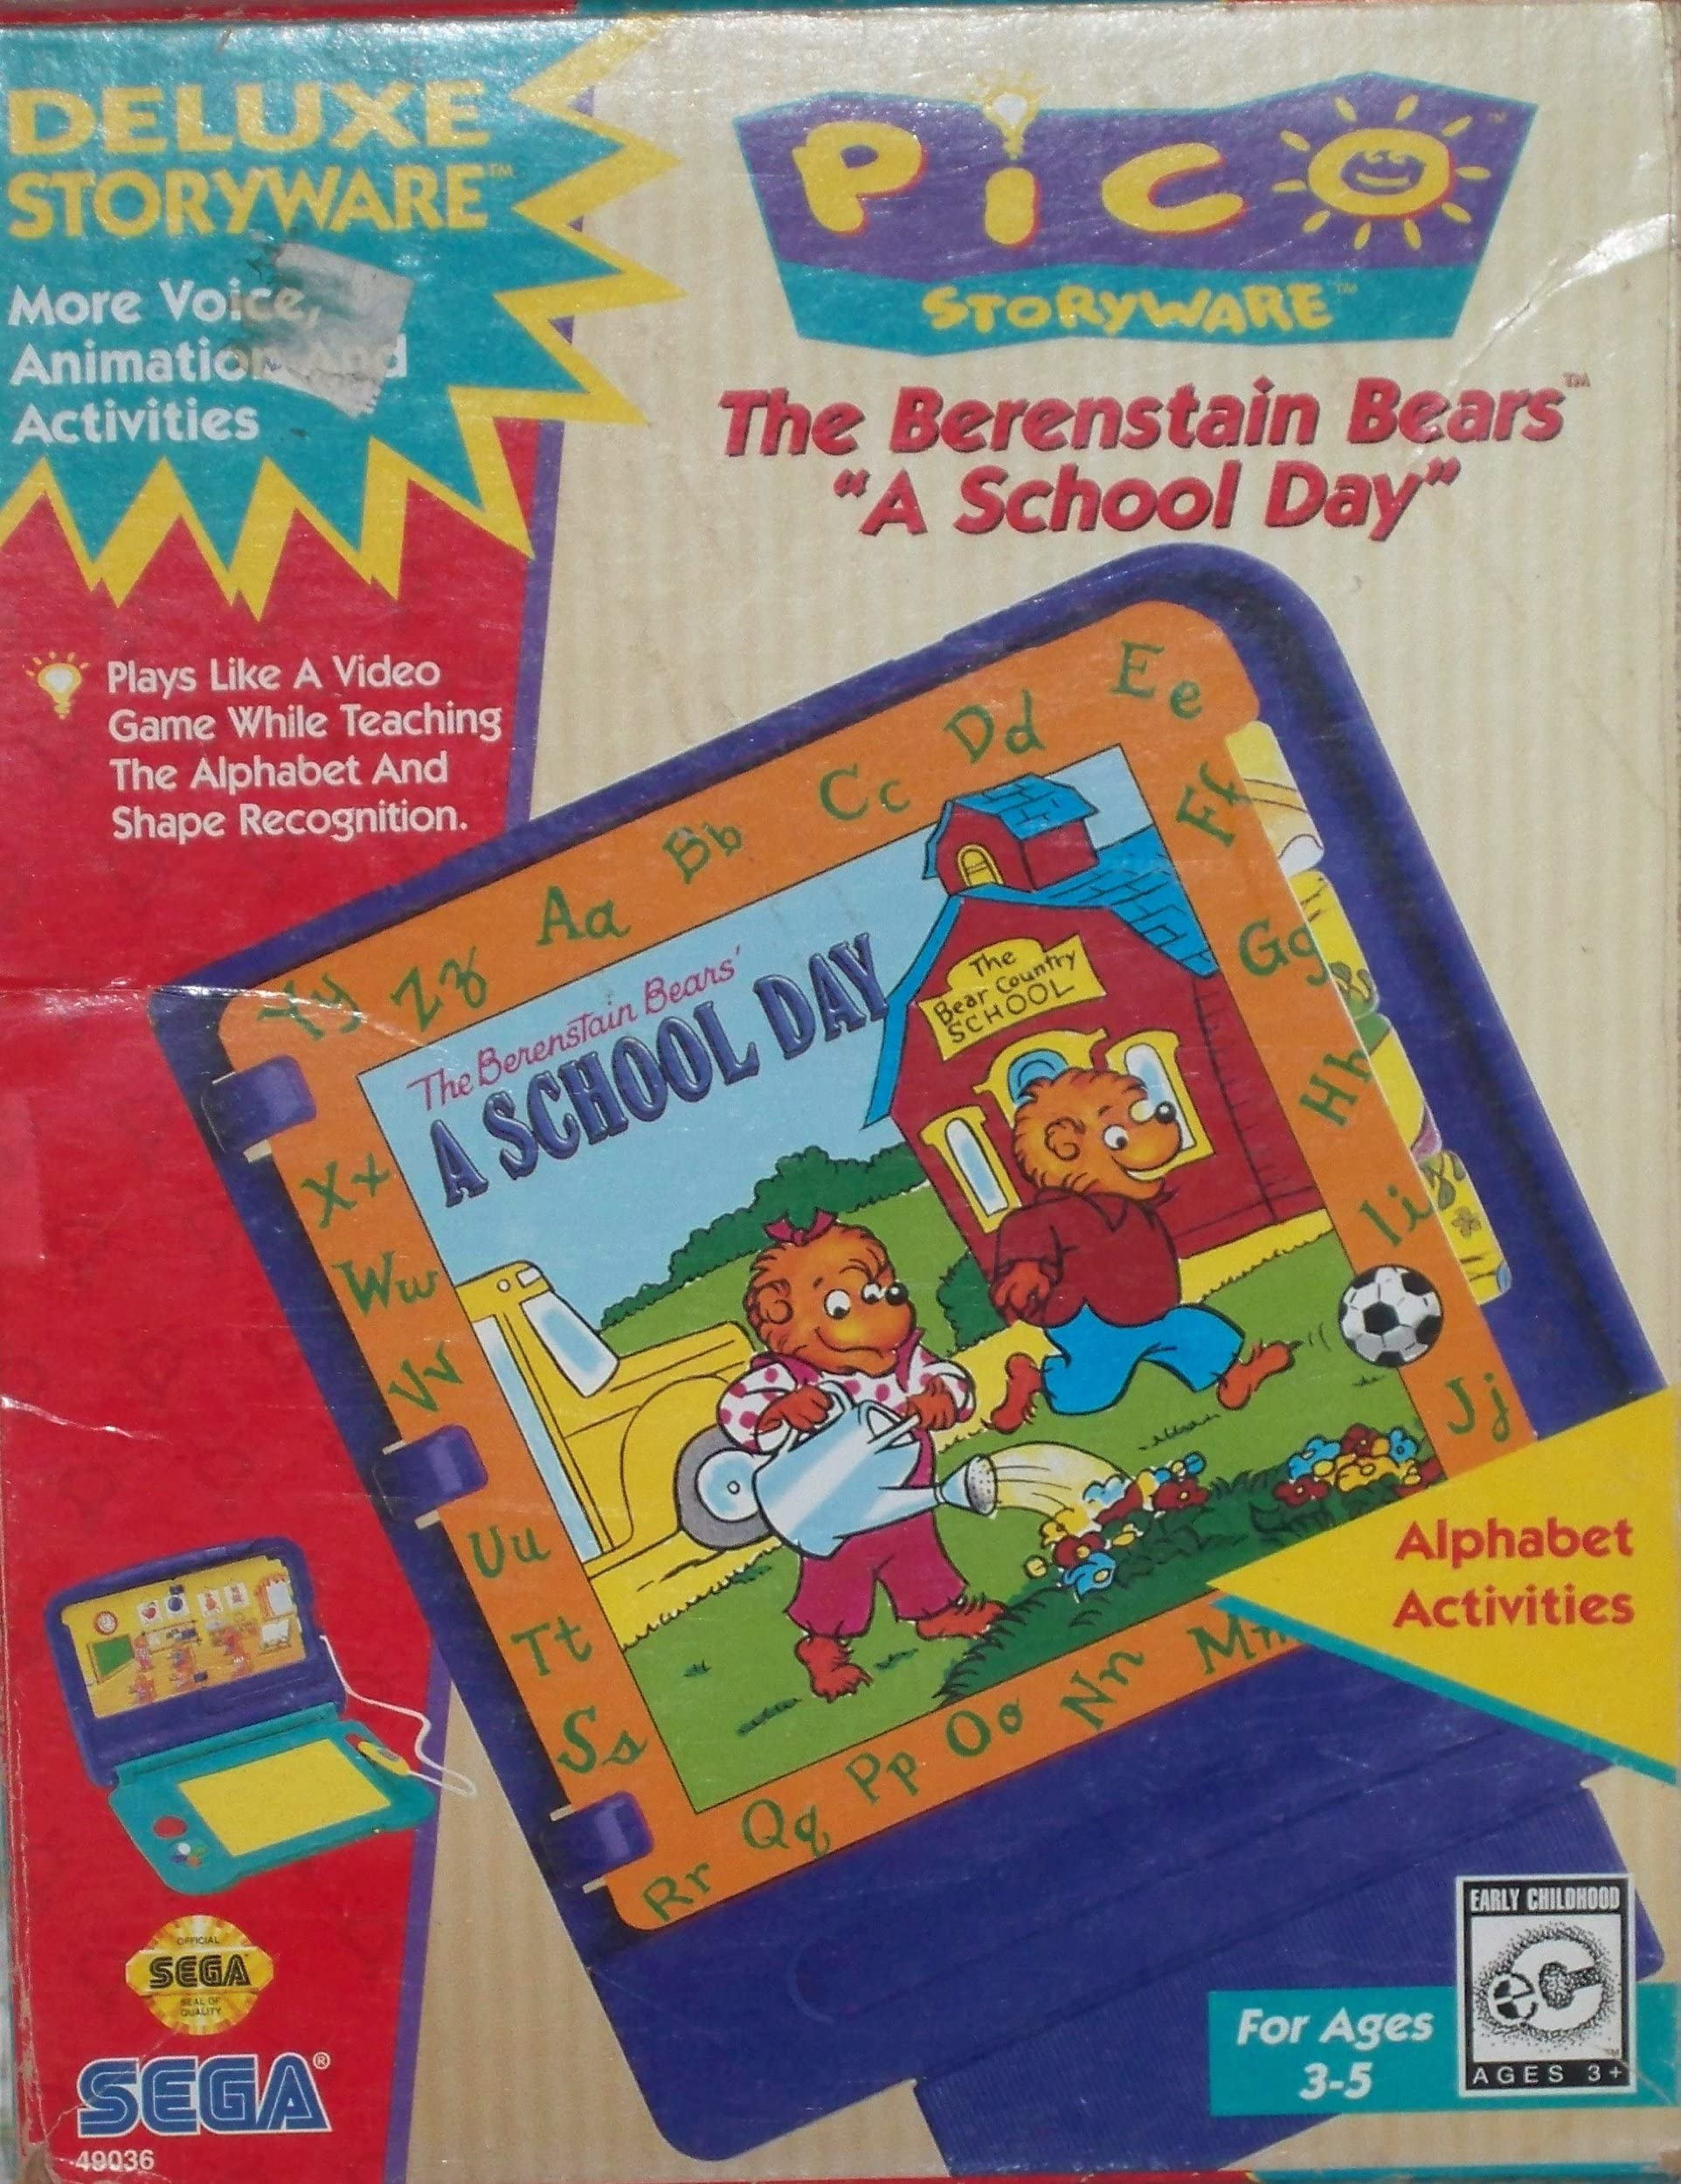 Amazon com: Pico Storyware The Berenstain Bears A School Day